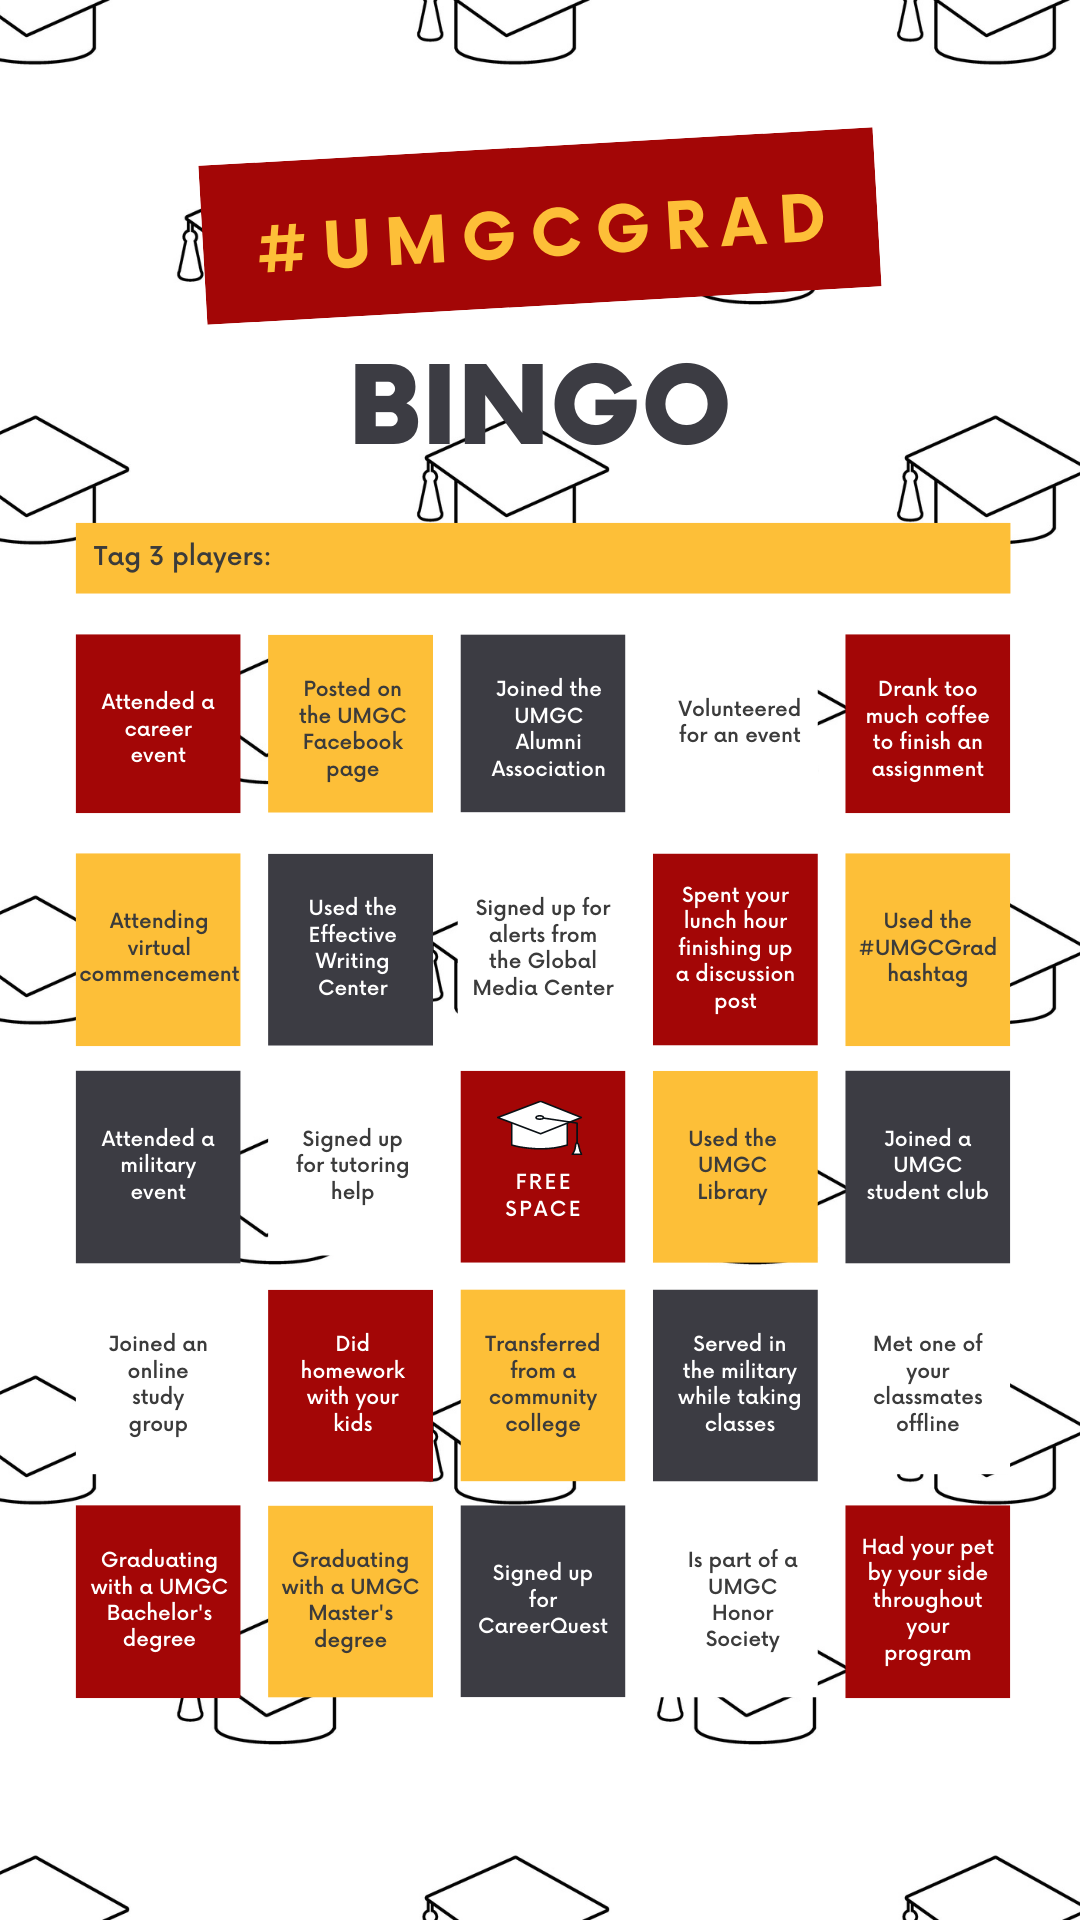 Bingo: Social media toolkit image template 1 for Facebook or Instagram Stories